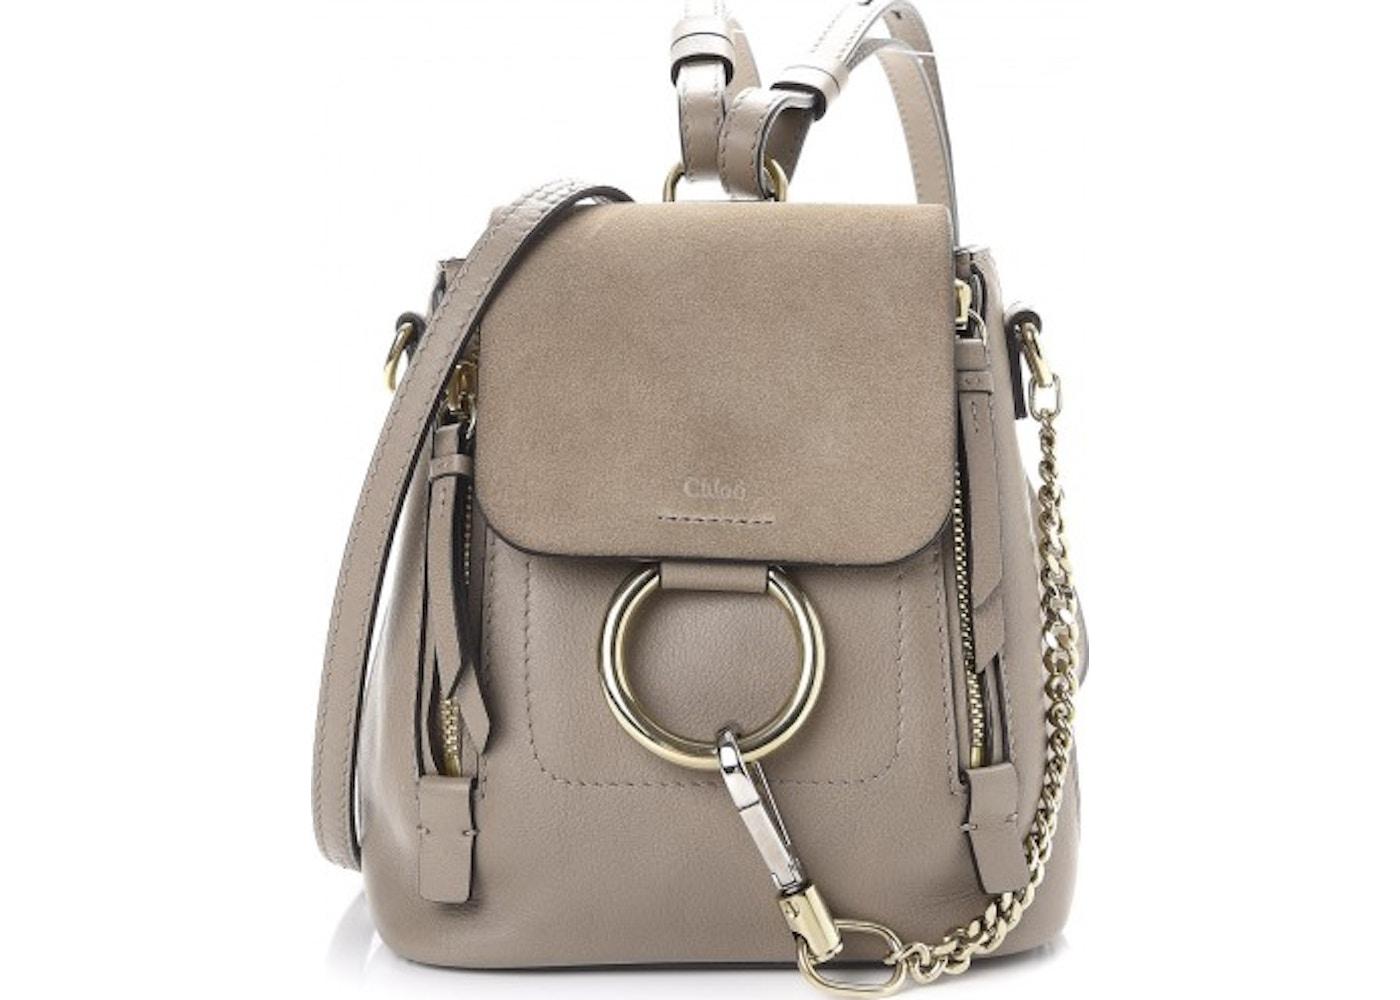 bfe2e870f52a Chloe Faye Backpack Smooth/Suede Mini Motty Grey. Smooth/Suede Mini Motty  Grey